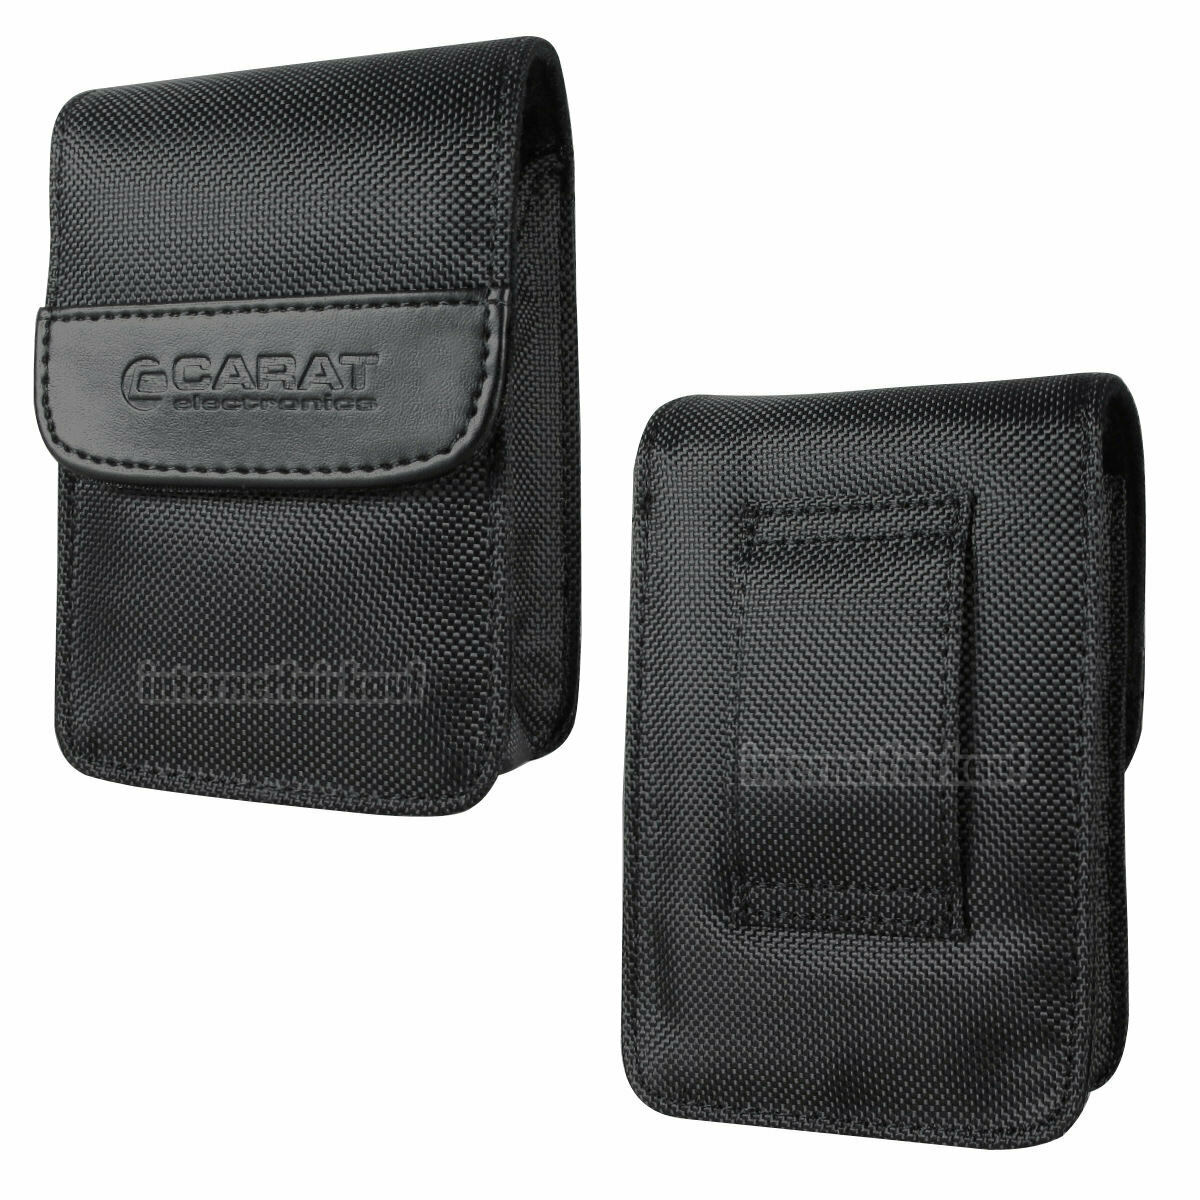 Kameratasche passend für Panasonic Lumix DMC-TZ18 TZ22 TZ25 - Etui